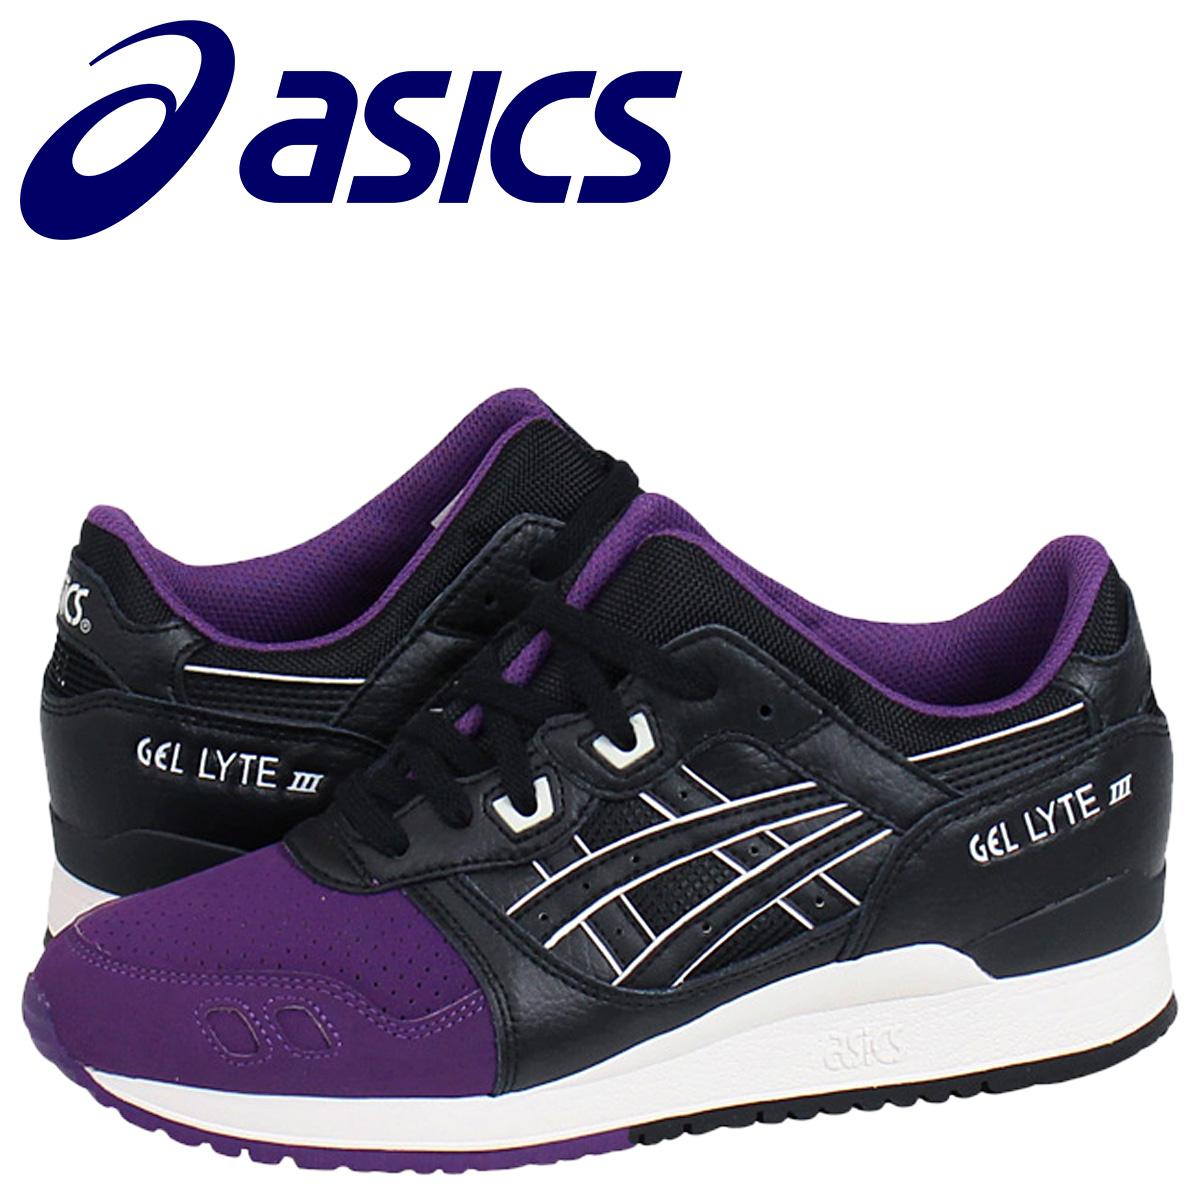 low priced 9b447 ac2f2 asics ASICS gel light 3 sneakers GEL-LYTE 3 TQ5V0L-3390 men gap Dis shoes  purple black black